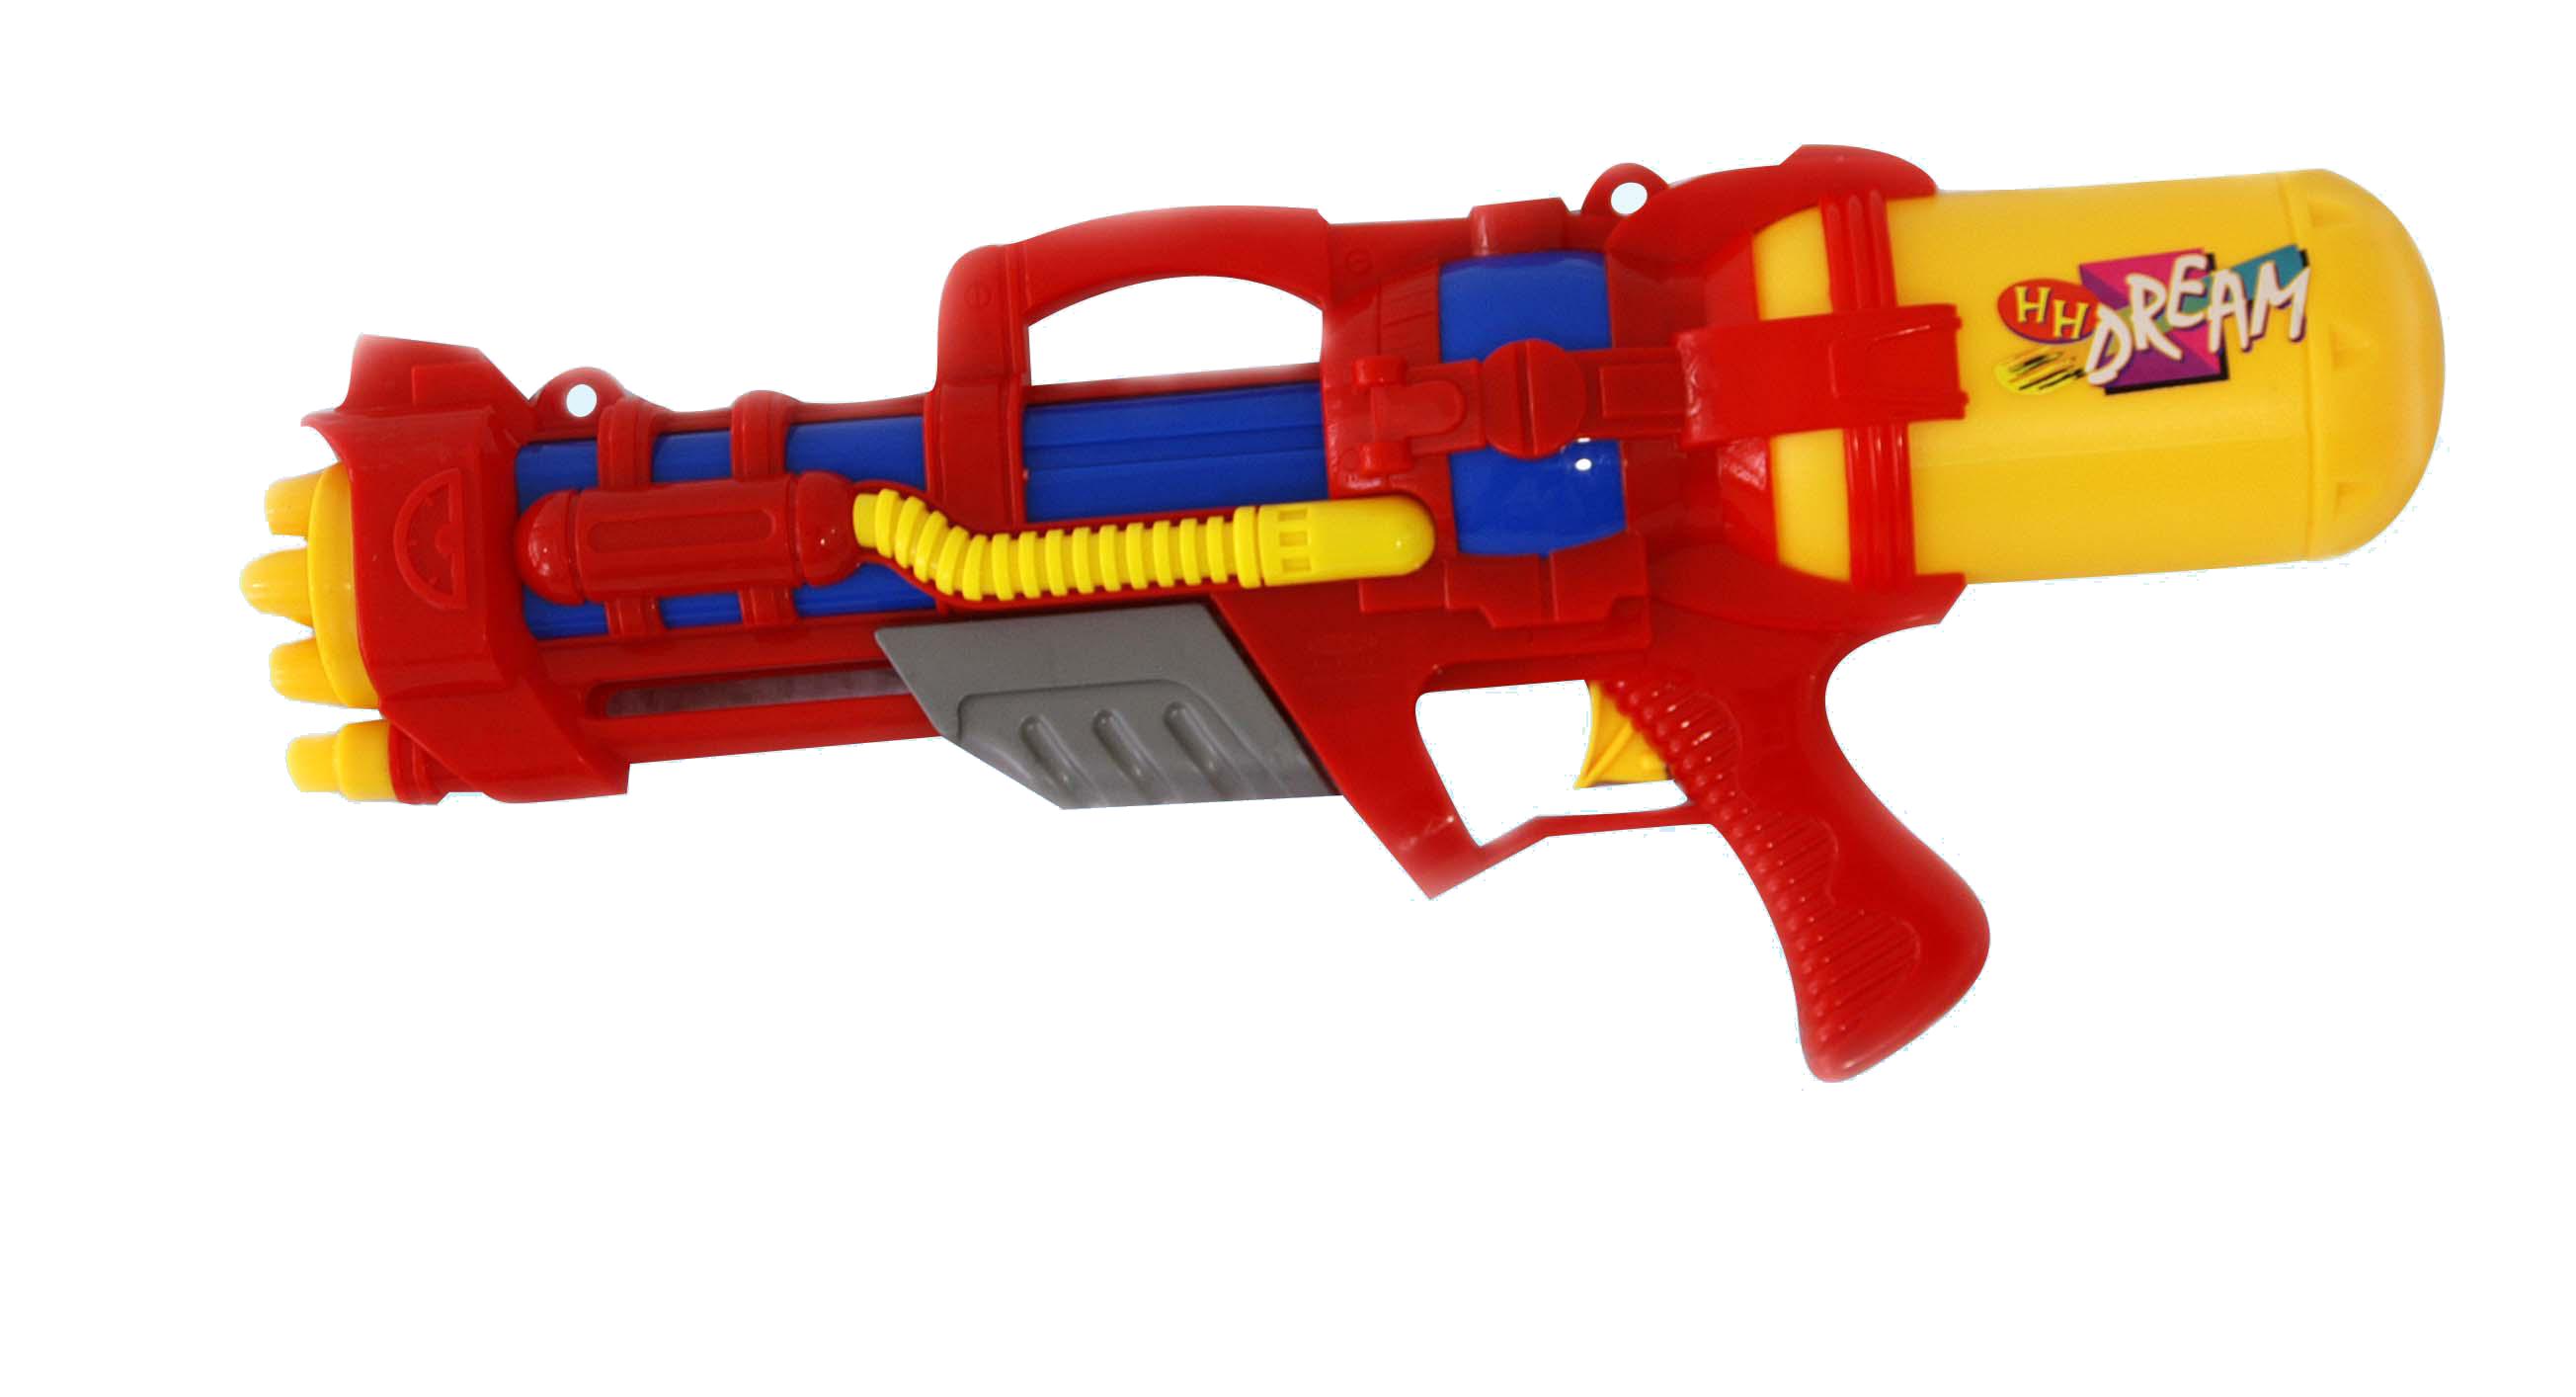 Clipart sword gun. Water png transparent images